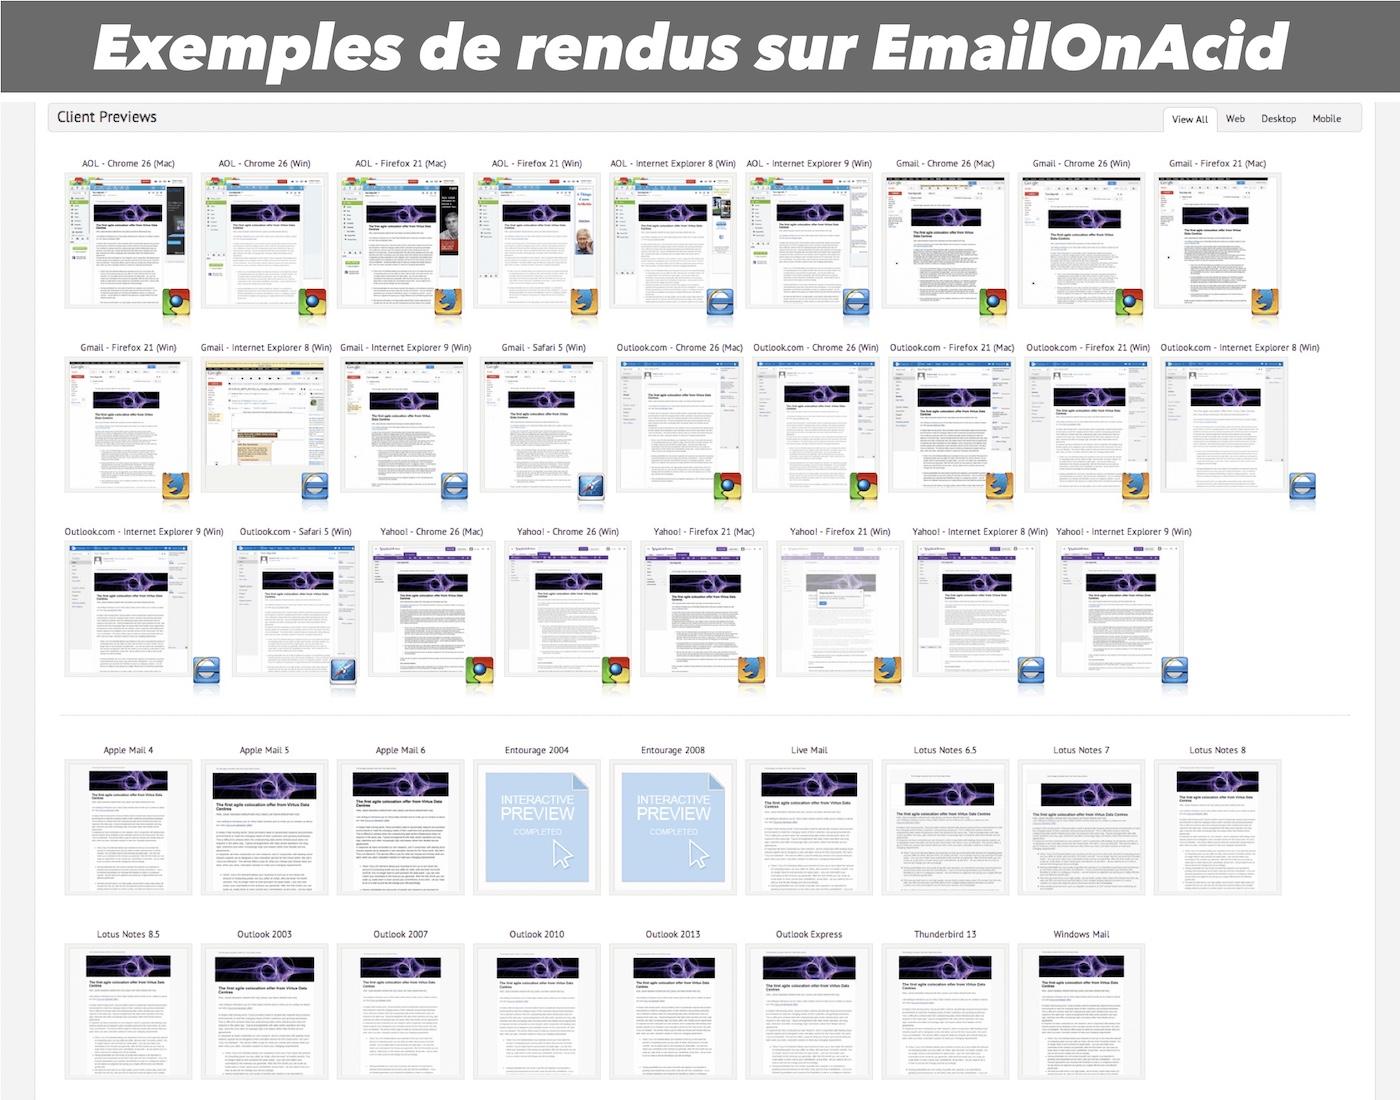 exemples de tests emails sur emailonacid